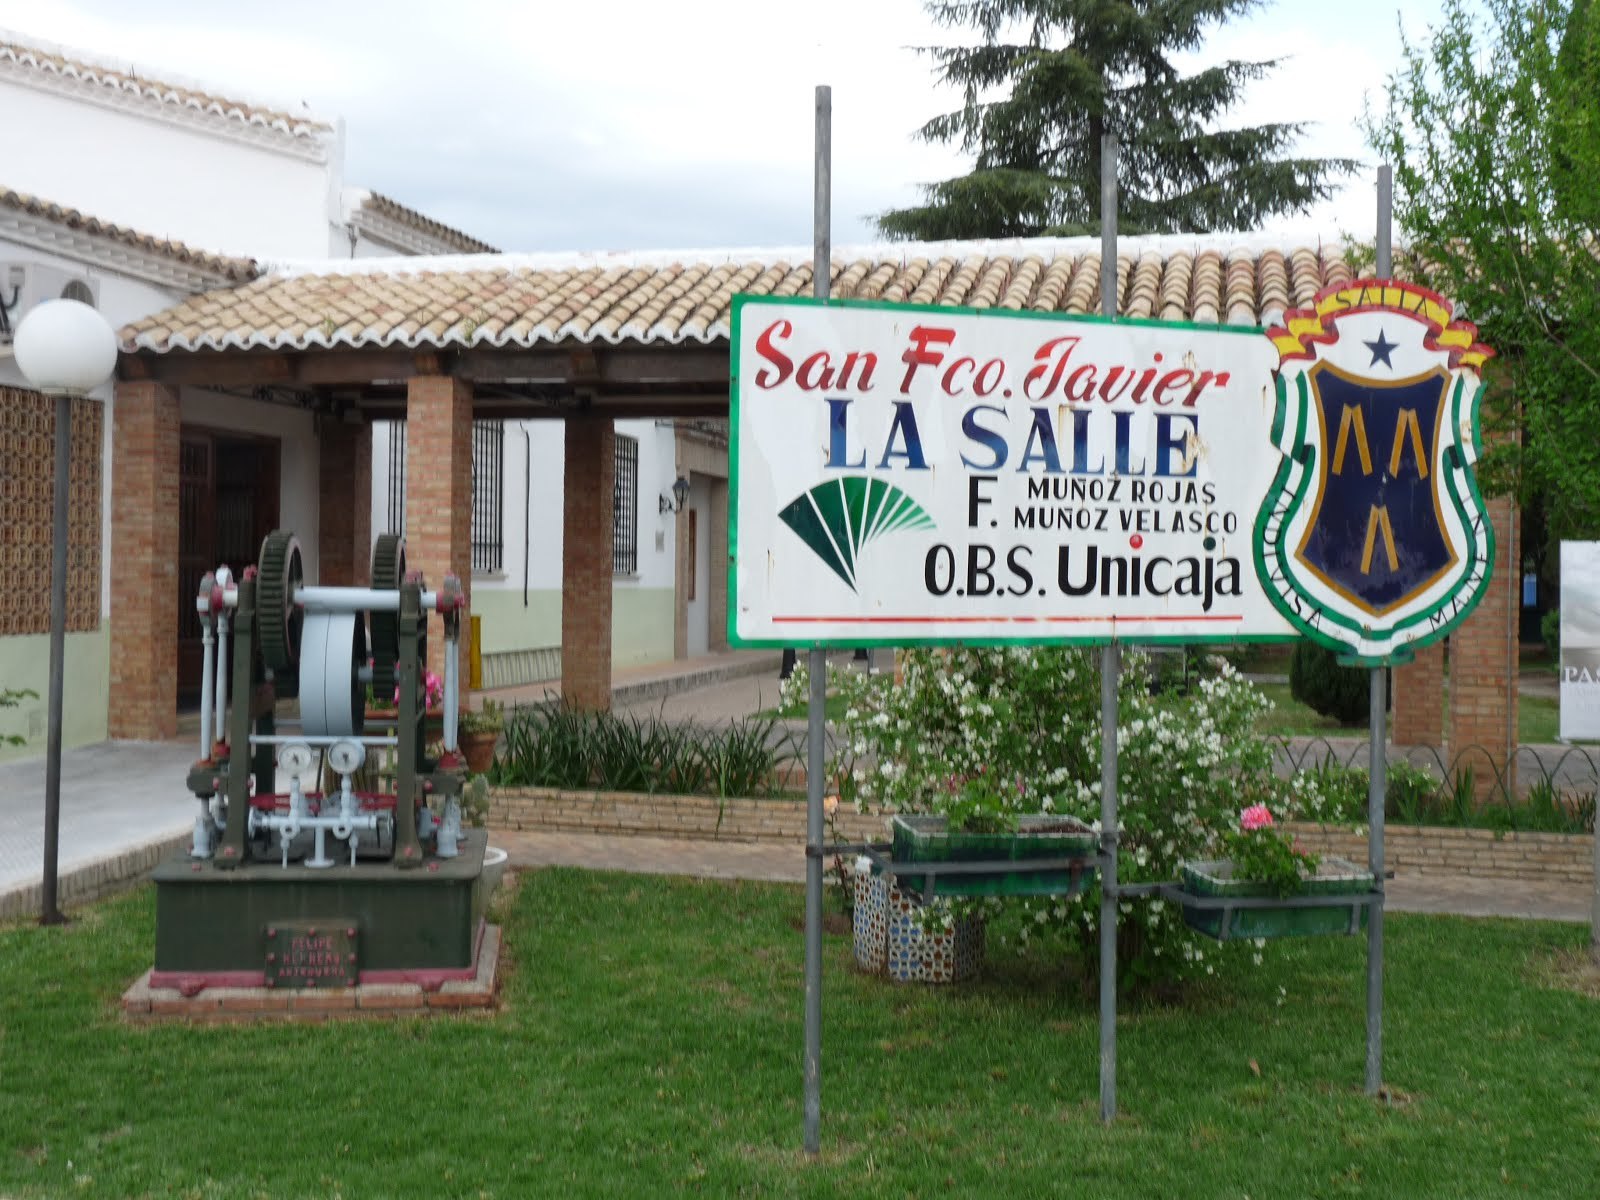 CENTRO SAN FCO JAVIER - VIRLECHA LA SALLE